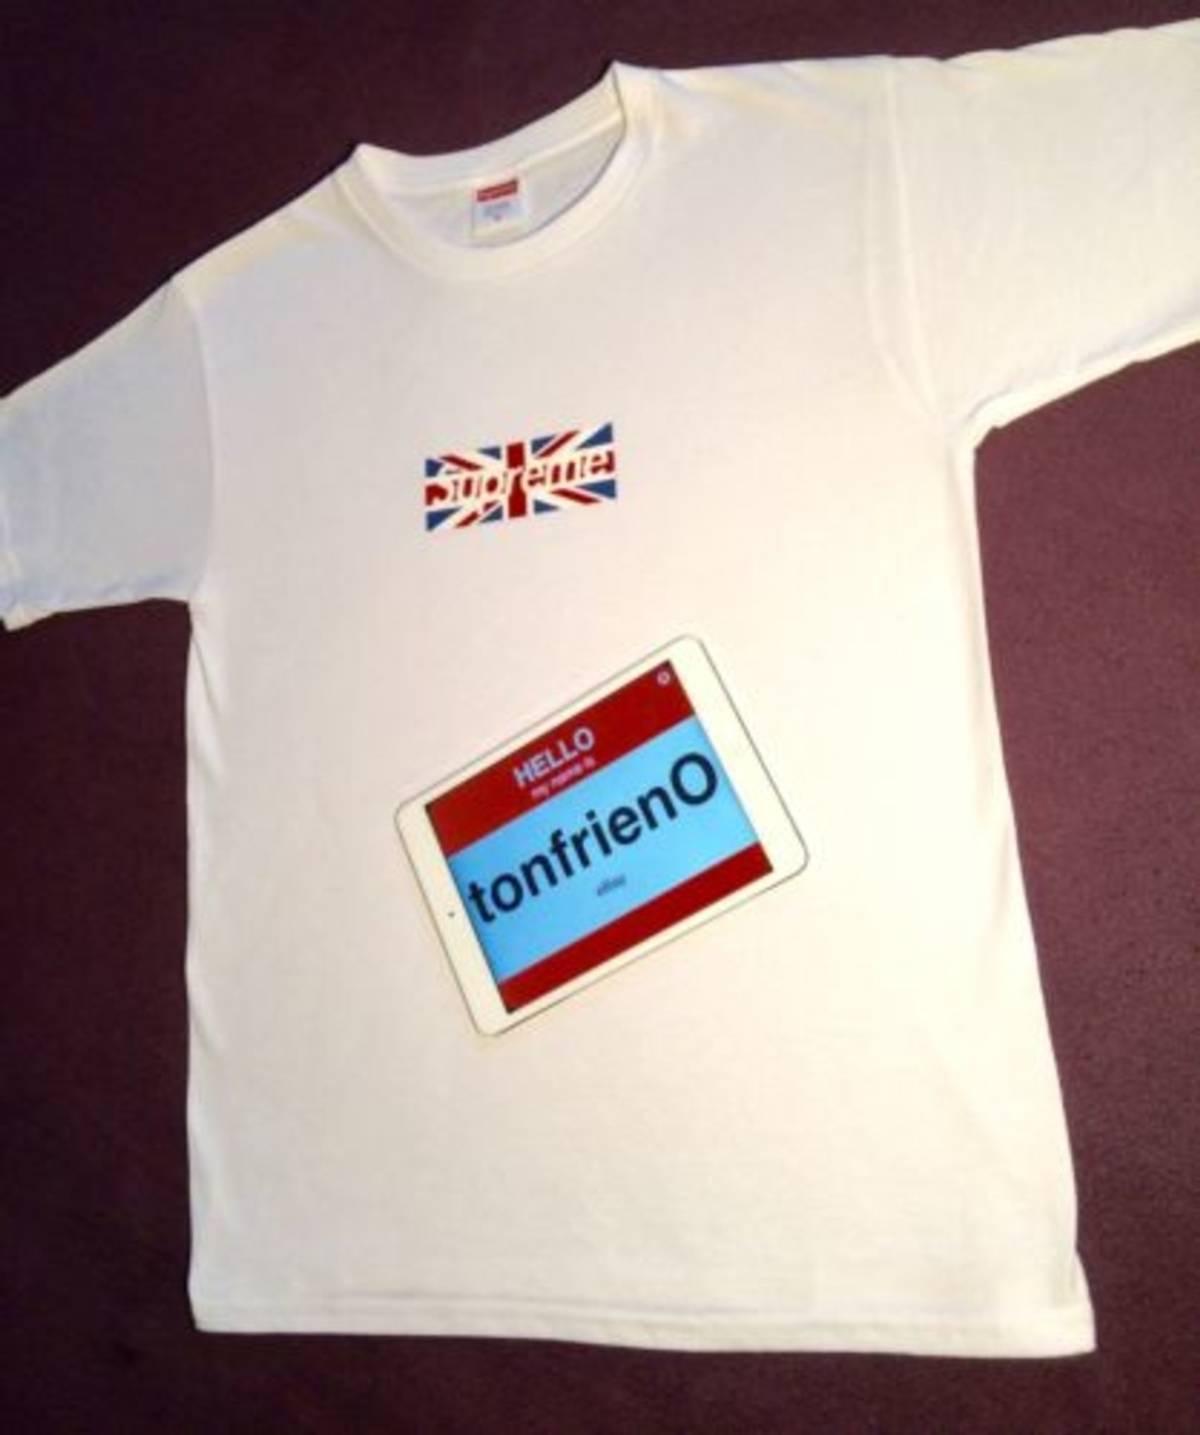 Supreme Supreme London Box Logo Tee Size m - Short Sleeve T-Shirts for Sale  - Grailed 098c3fb10